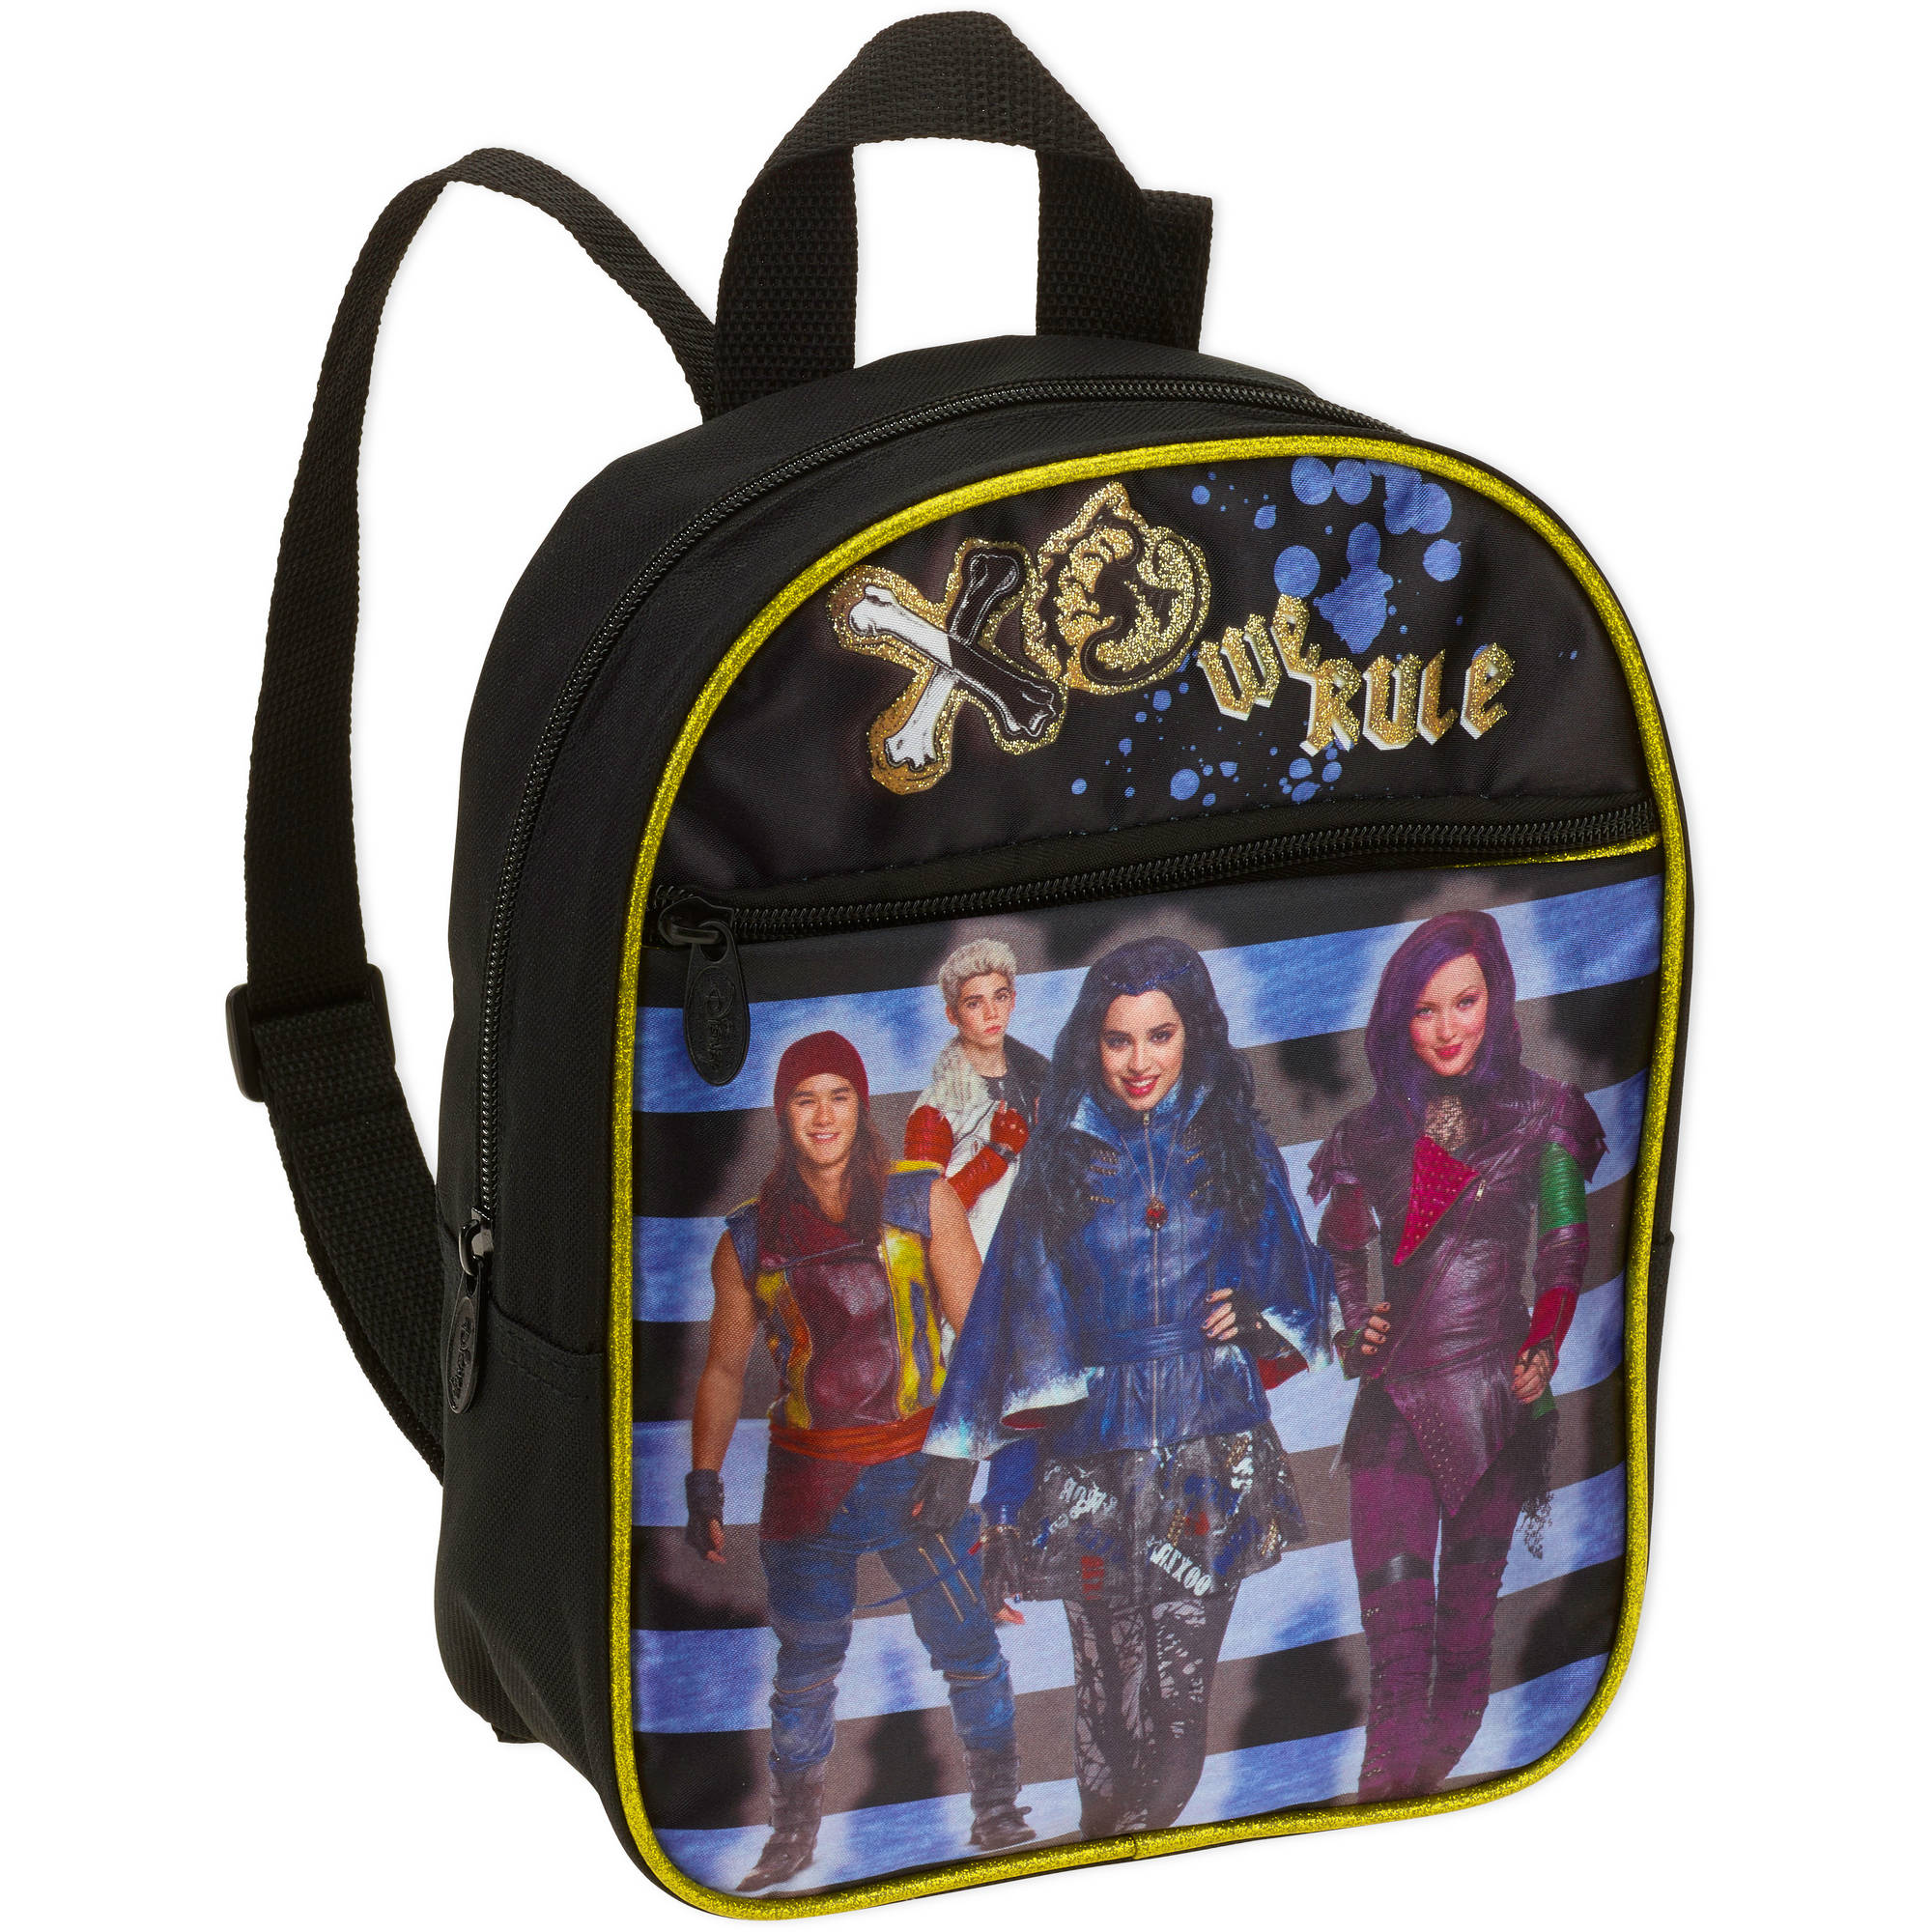 "Descendants 10"" Mini Backpack"